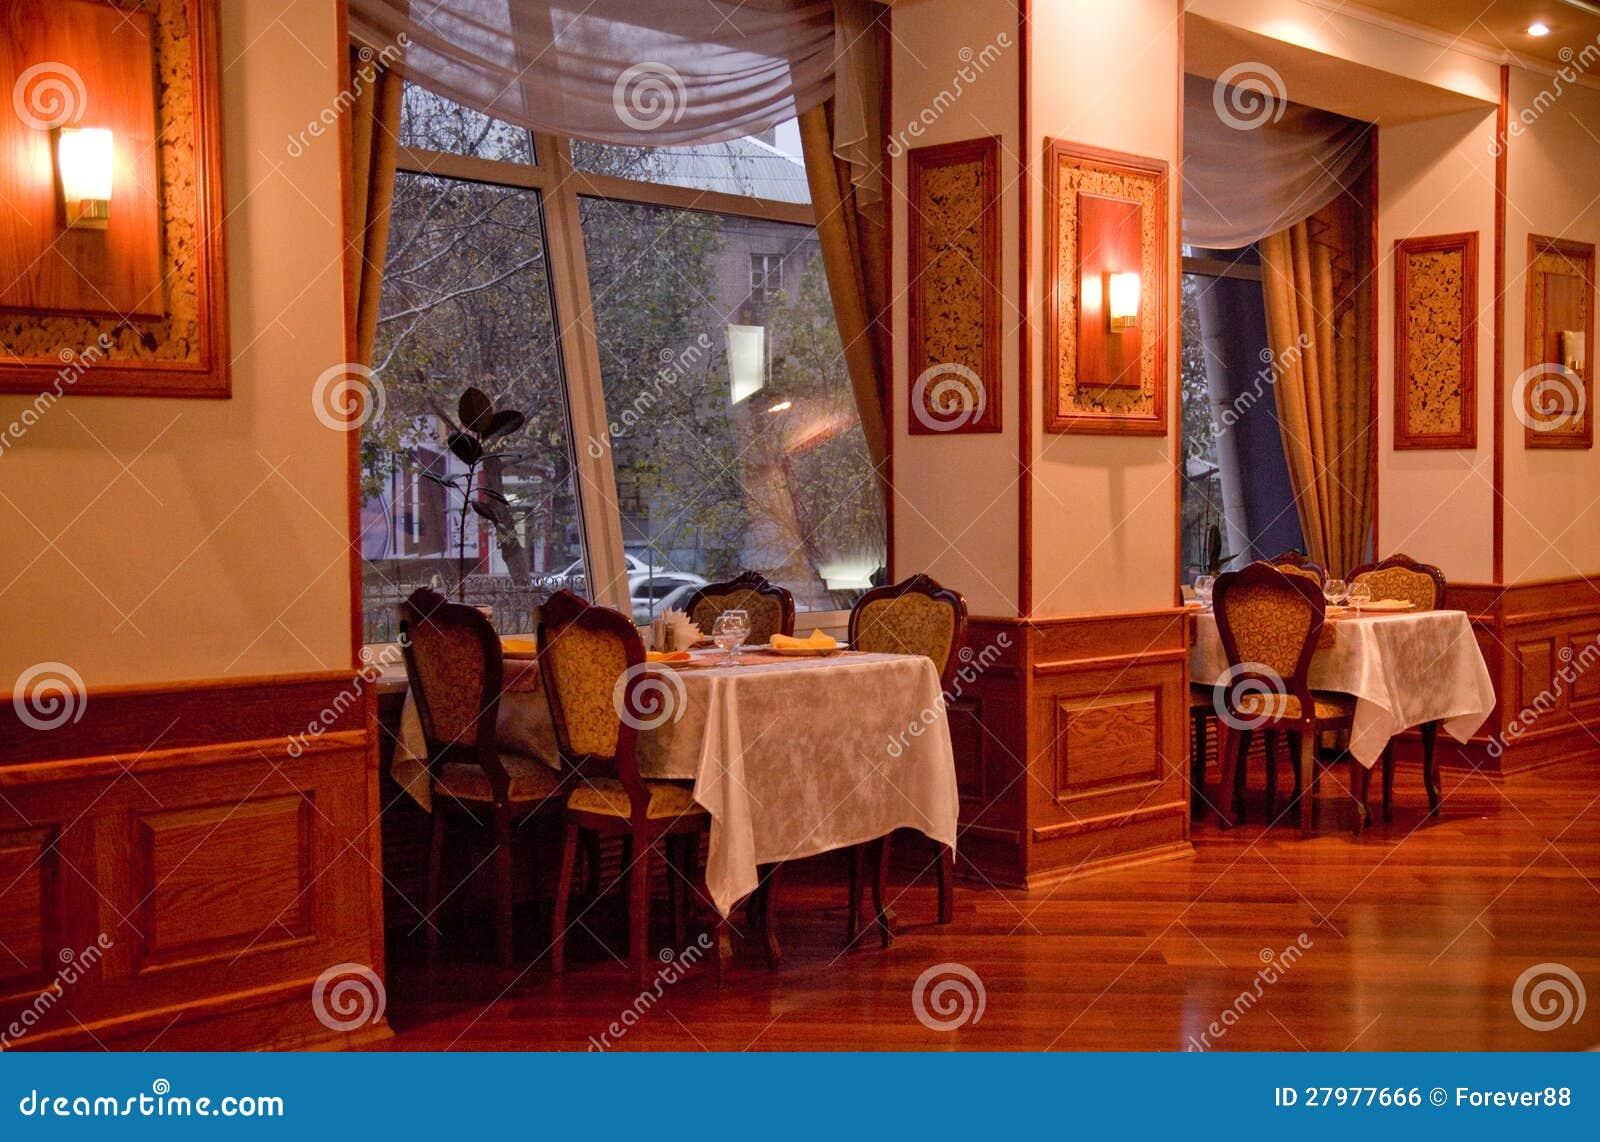 Vintage restaurant interior royalty free stock image